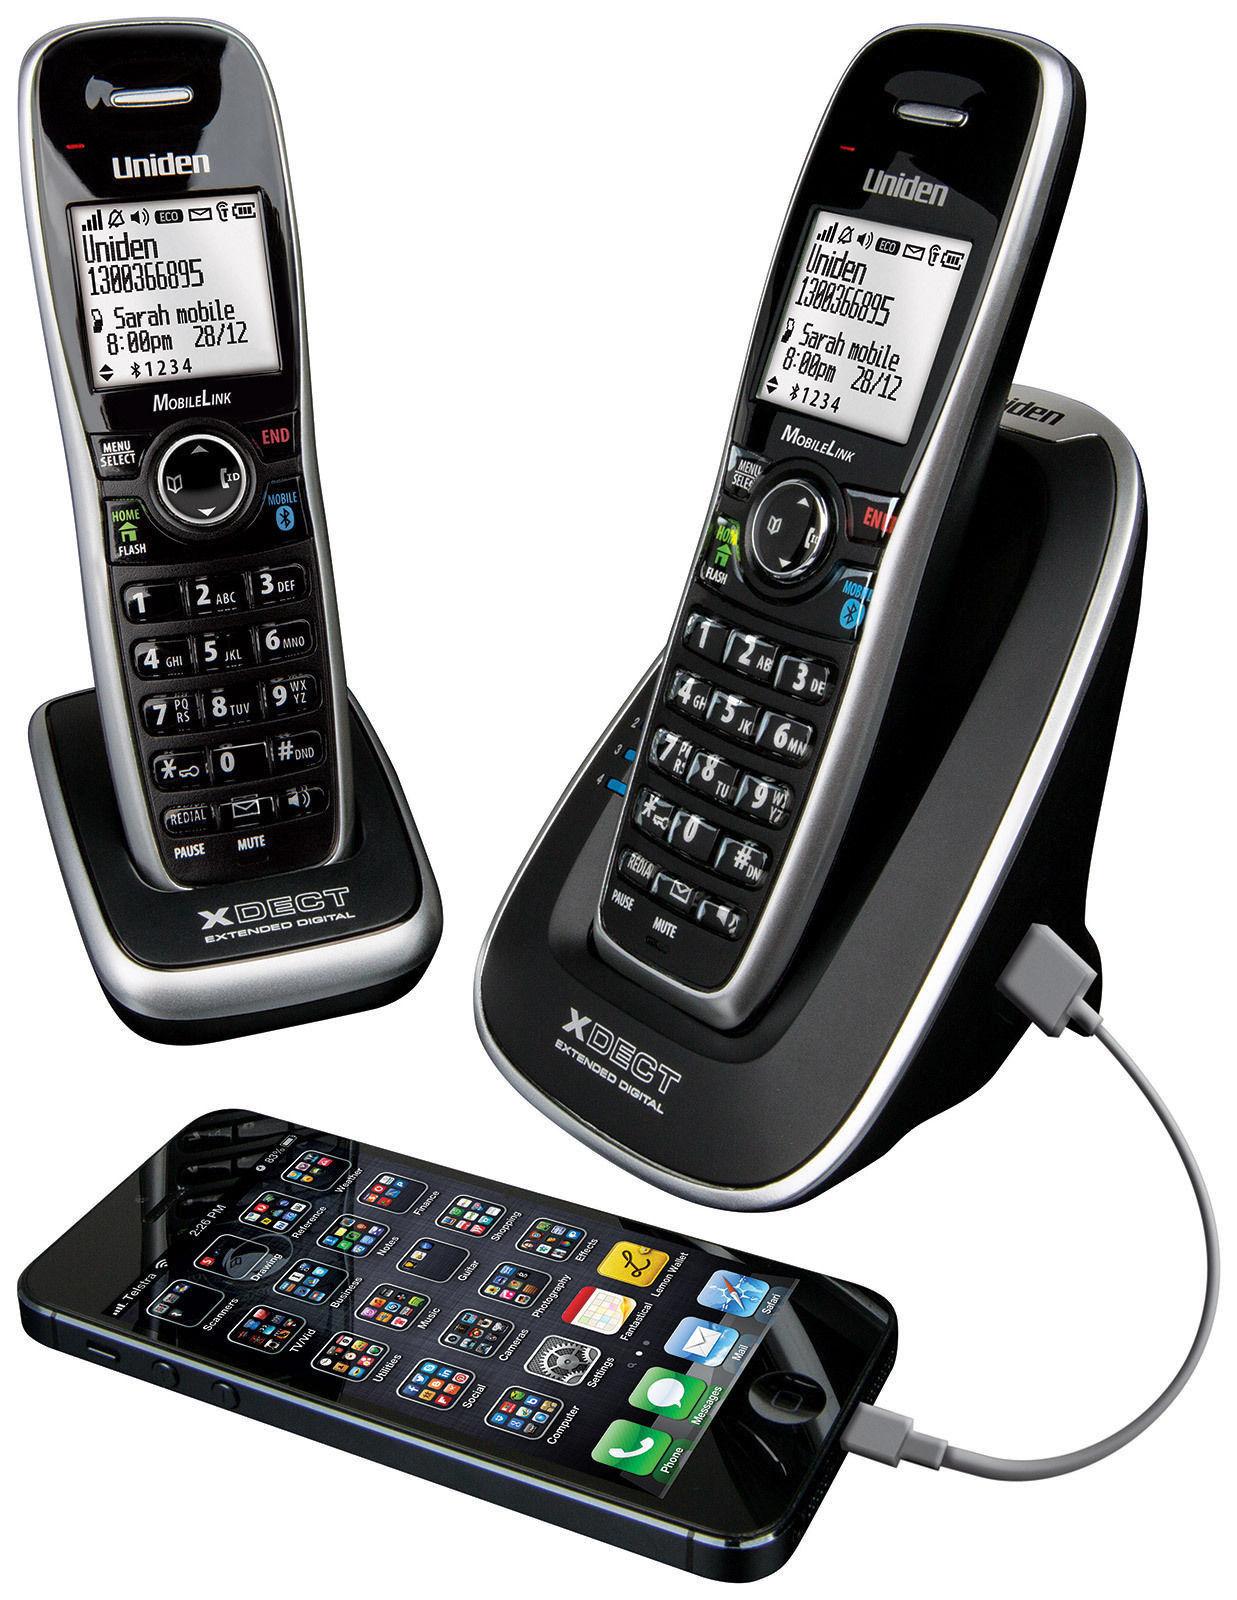 uniden 5.8 ghz cordless phone manual